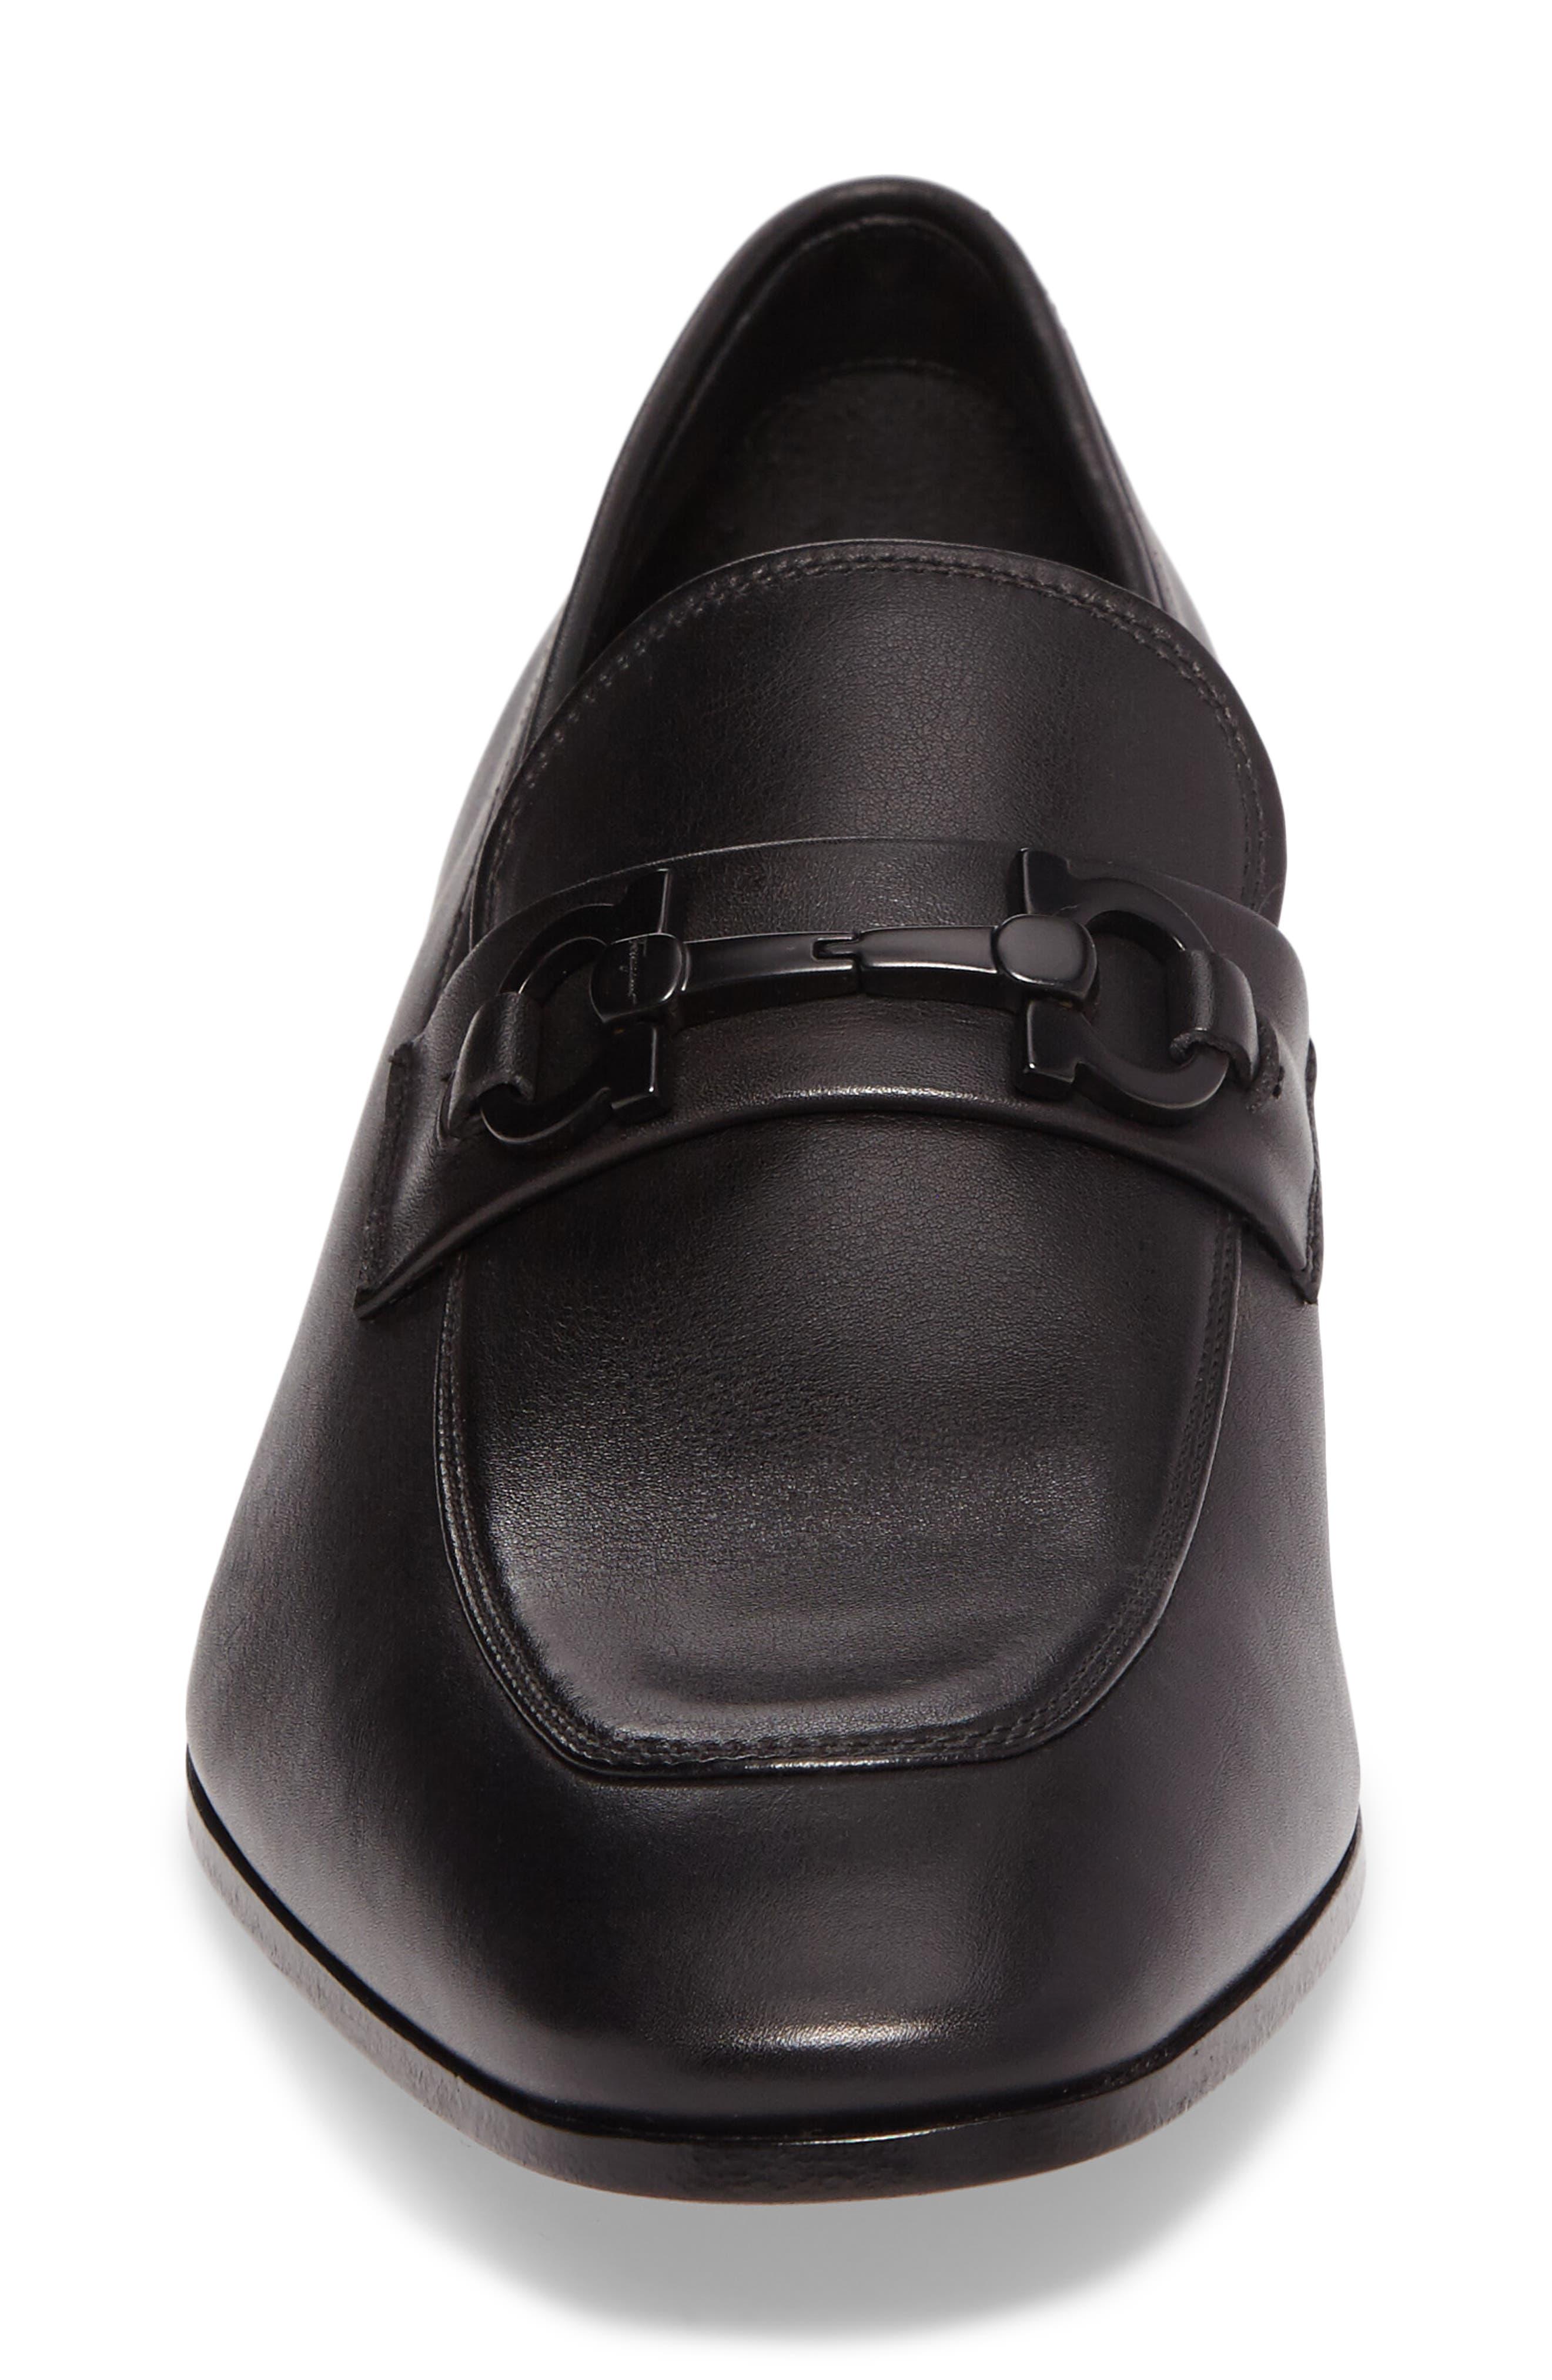 Cremona Bit Loafer,                             Alternate thumbnail 4, color,                             001